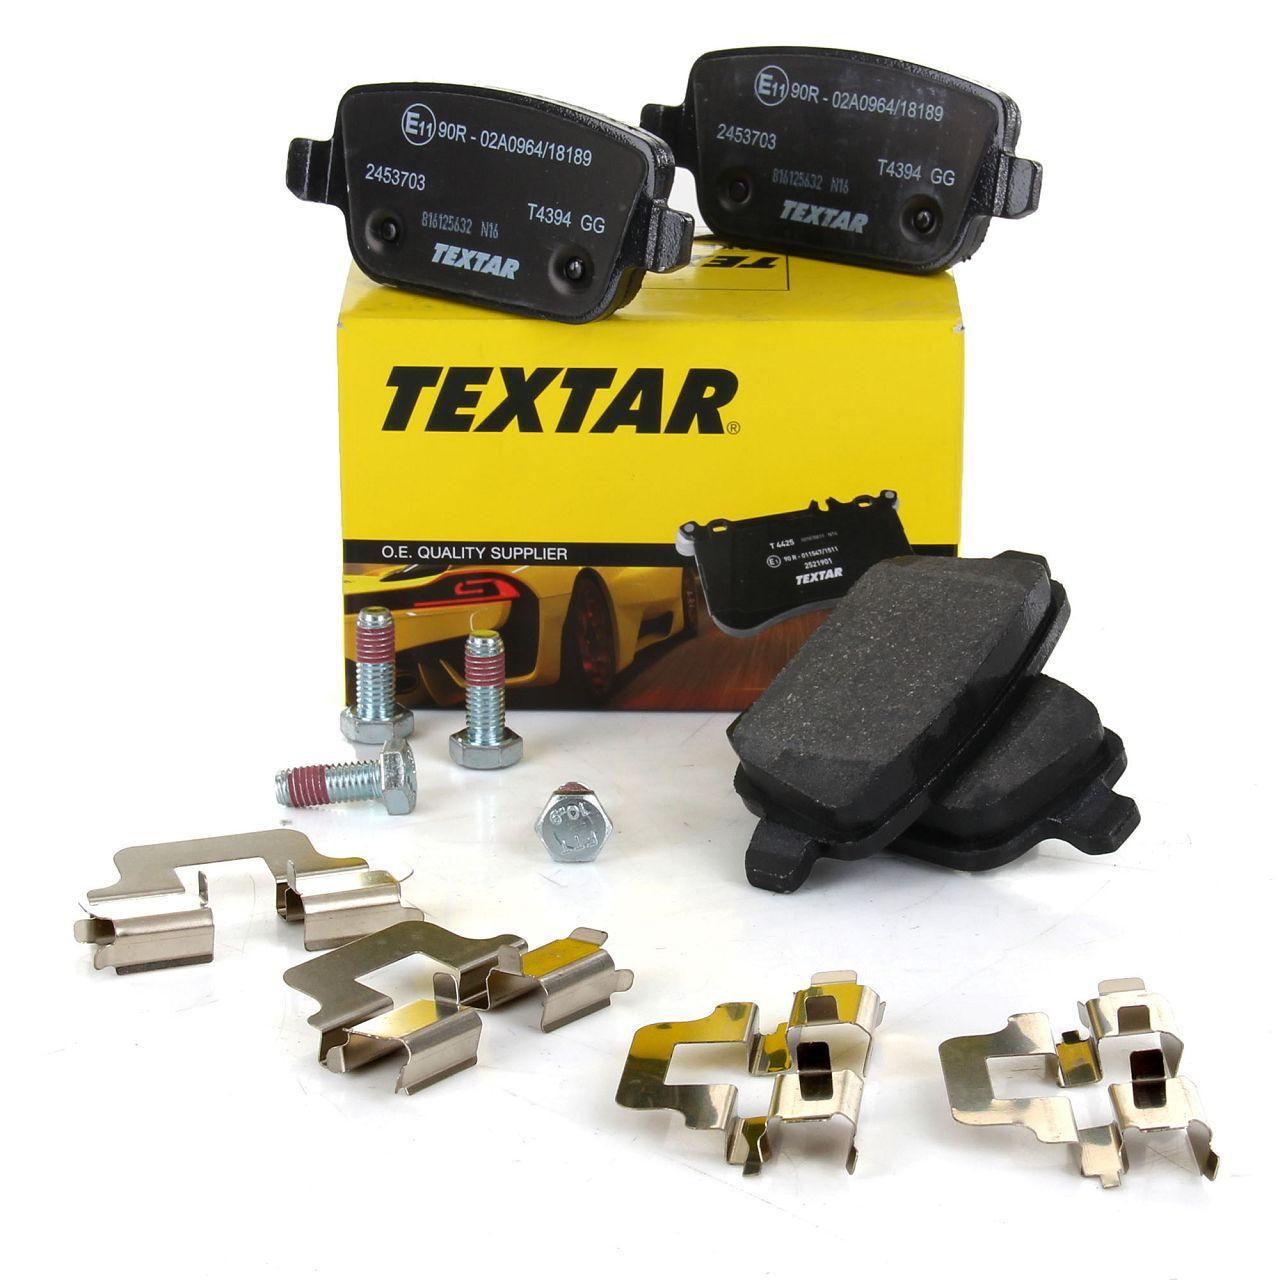 TEXTAR Bremsbeläge für FORD FOCUS II 2.5 RS GALAXY KUGA I MONDEO IV S-MAX hinten